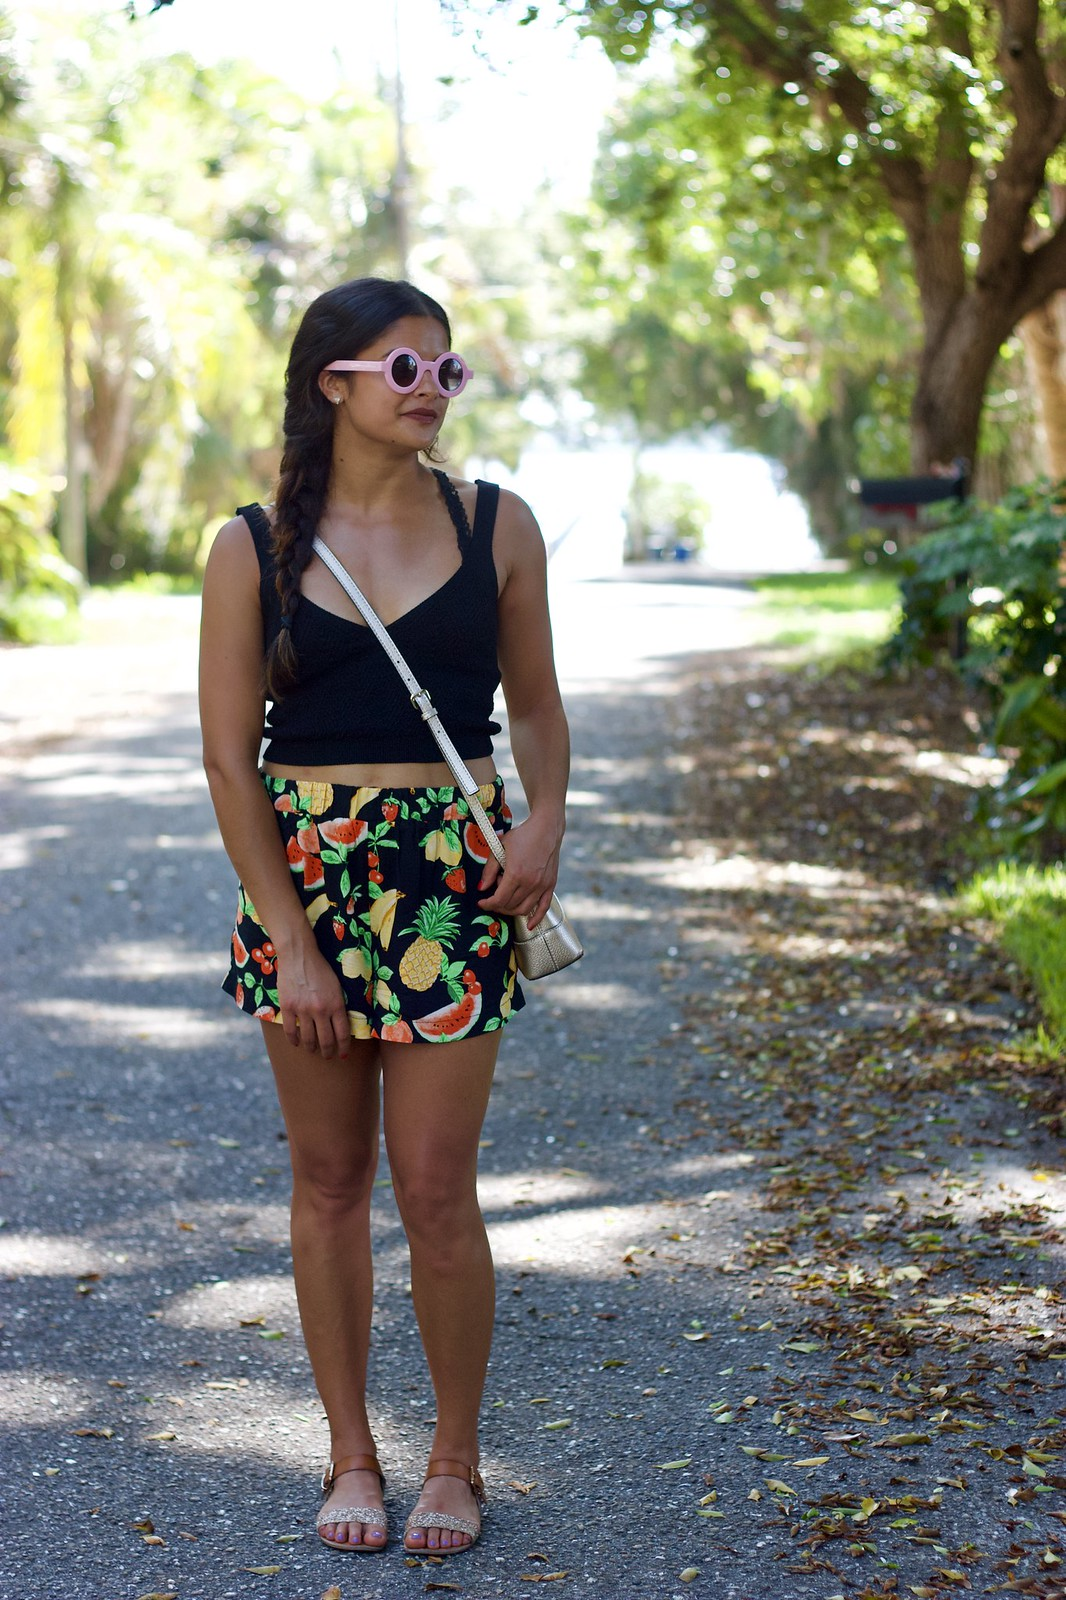 Priya the Blog, Nashville fashion blog, Nashville fashion blogger, Nashville style blog, Nashville style blogger, Summer outfit, fruit print shorts, Zara knit crop top,